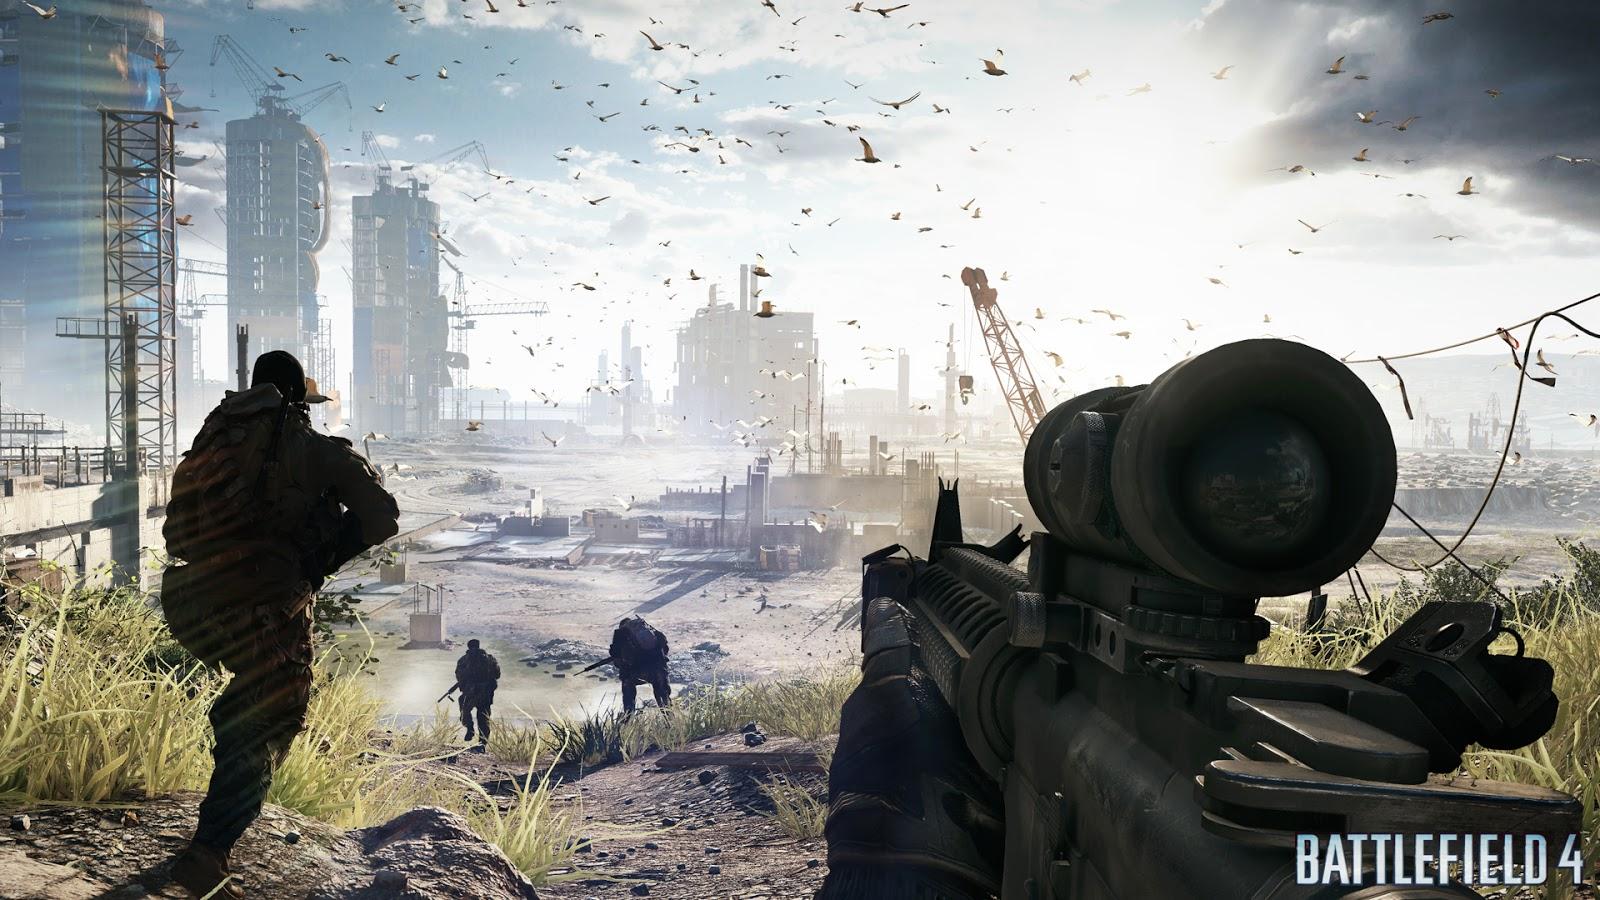 Battlefield 4 (BF4)